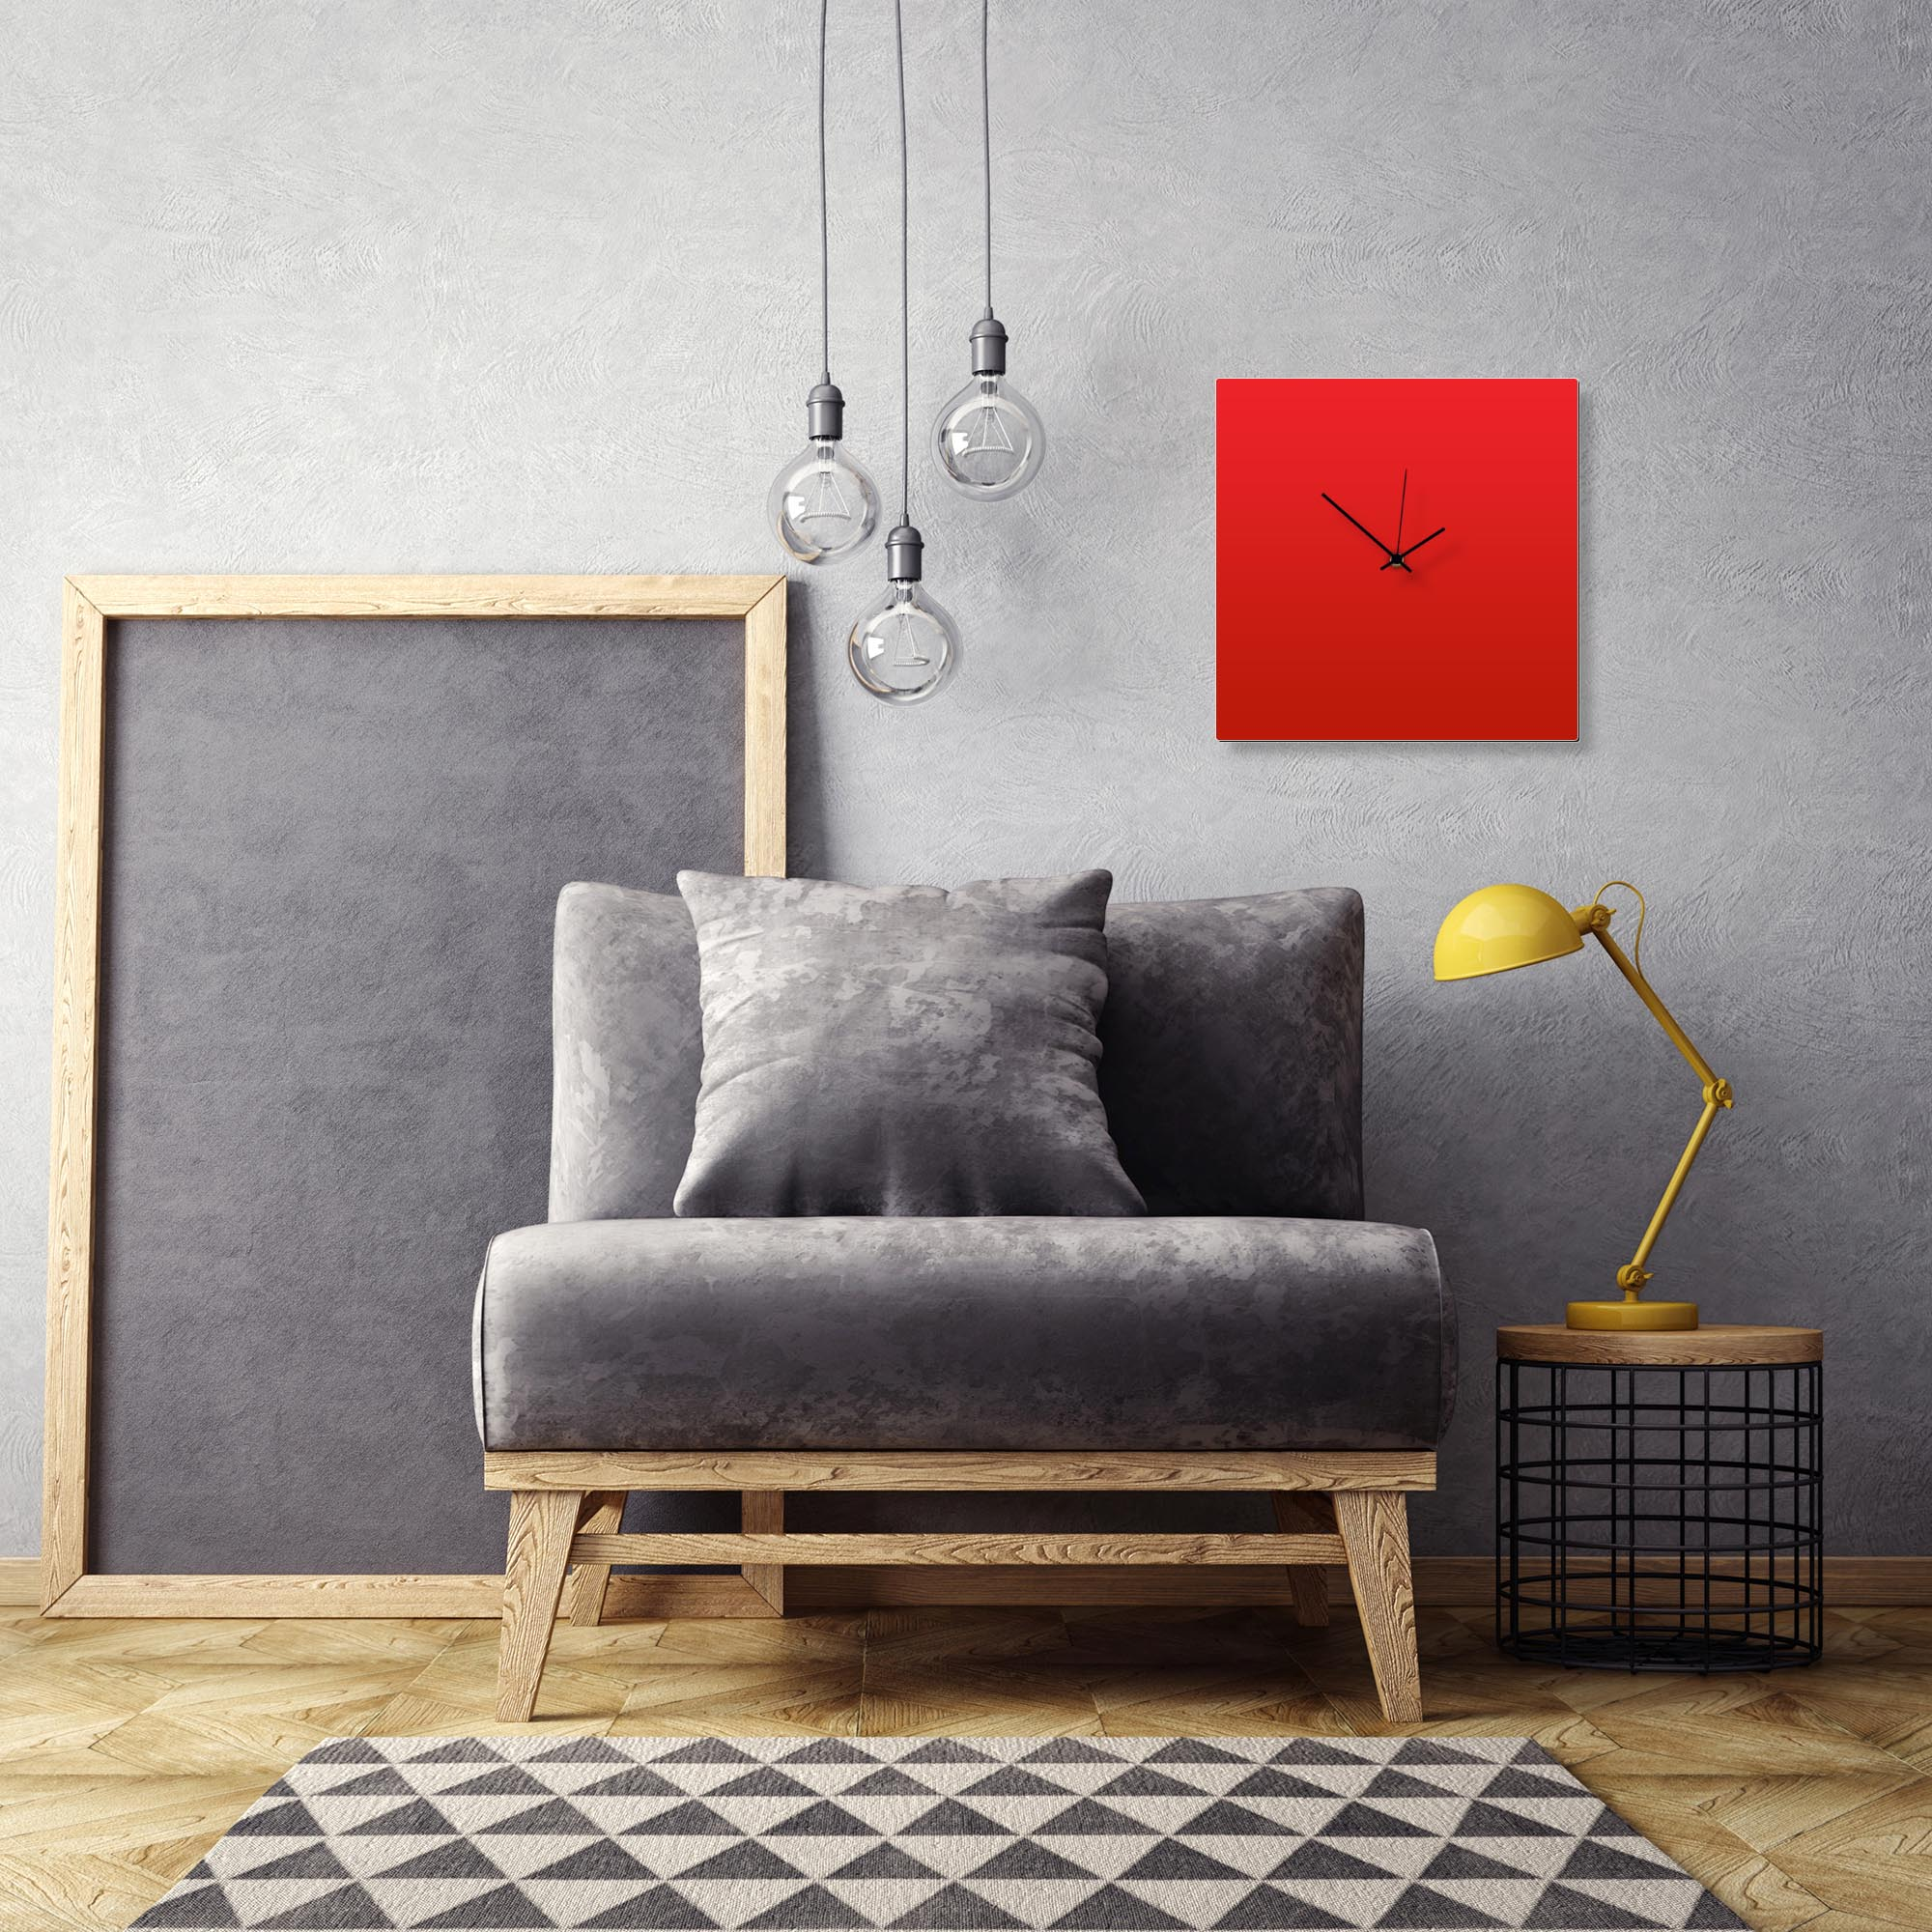 Redout Black Square Clock by Adam Schwoeppe Contemporary Clock on Aluminum Polymetal - Alternate View 1